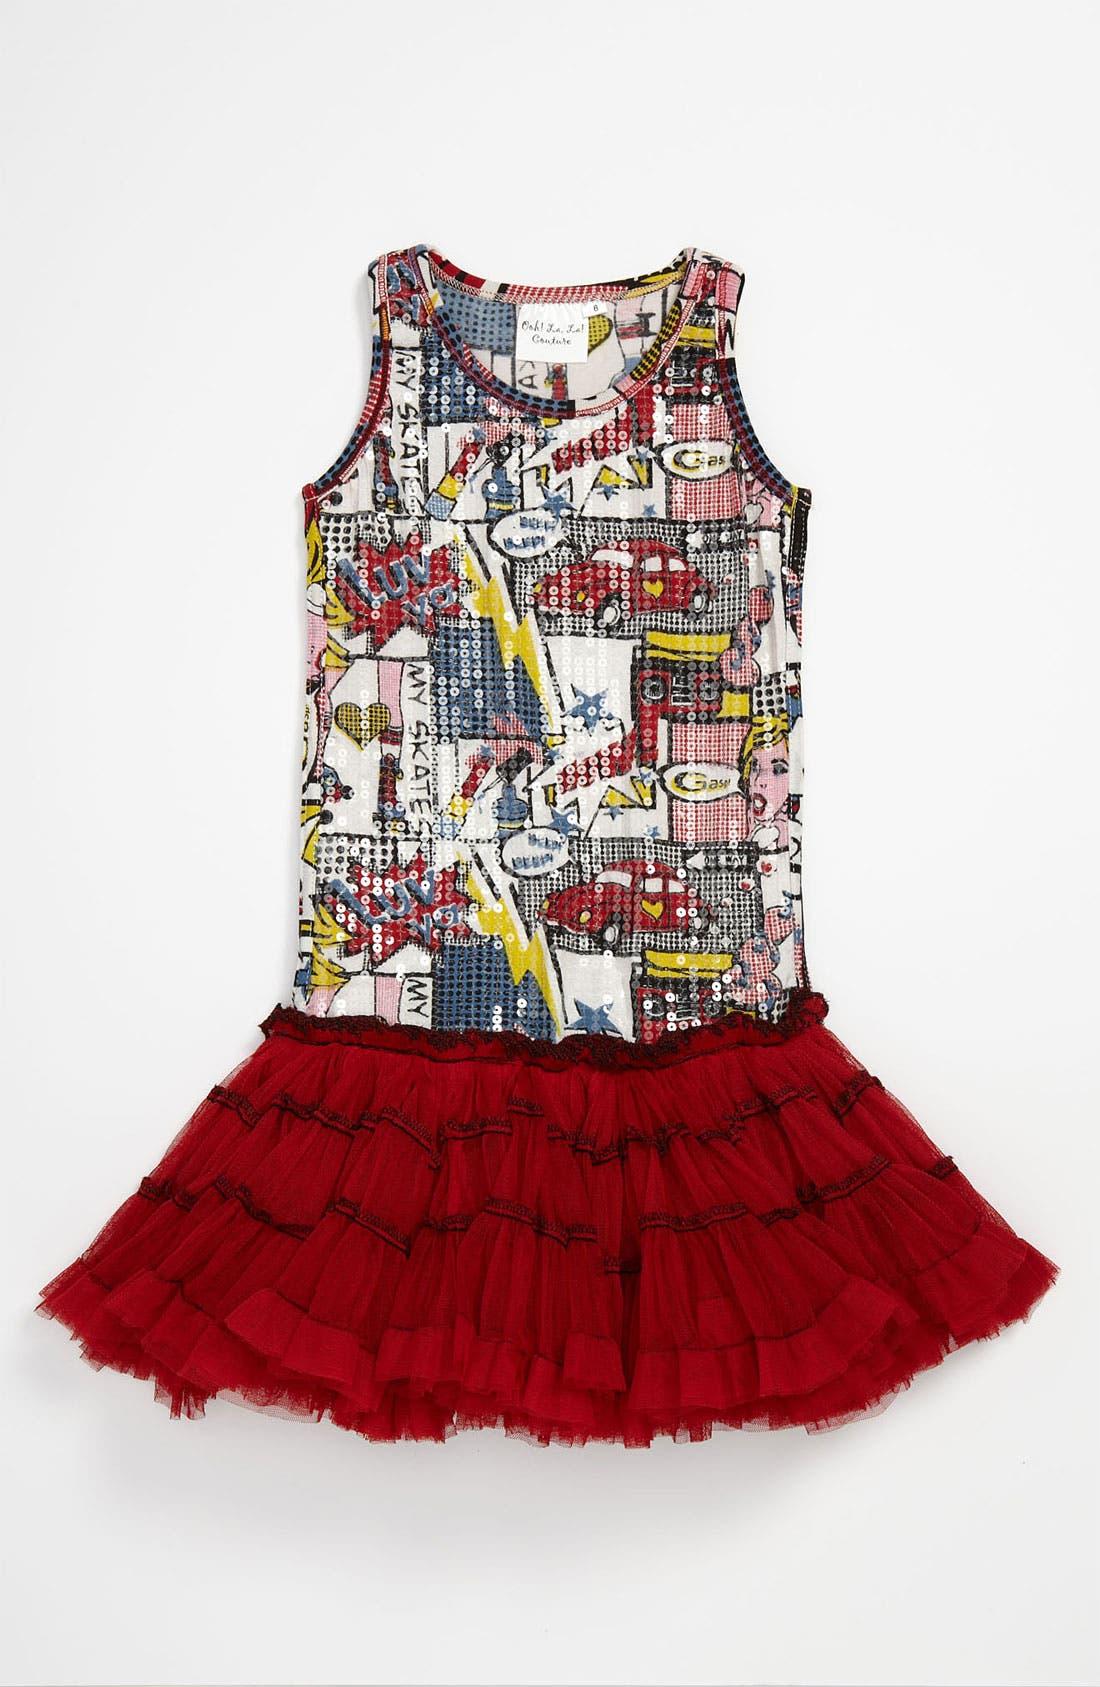 Main Image - Ooh! La, La! Couture Print Dress (Little Girls & Big Girls)